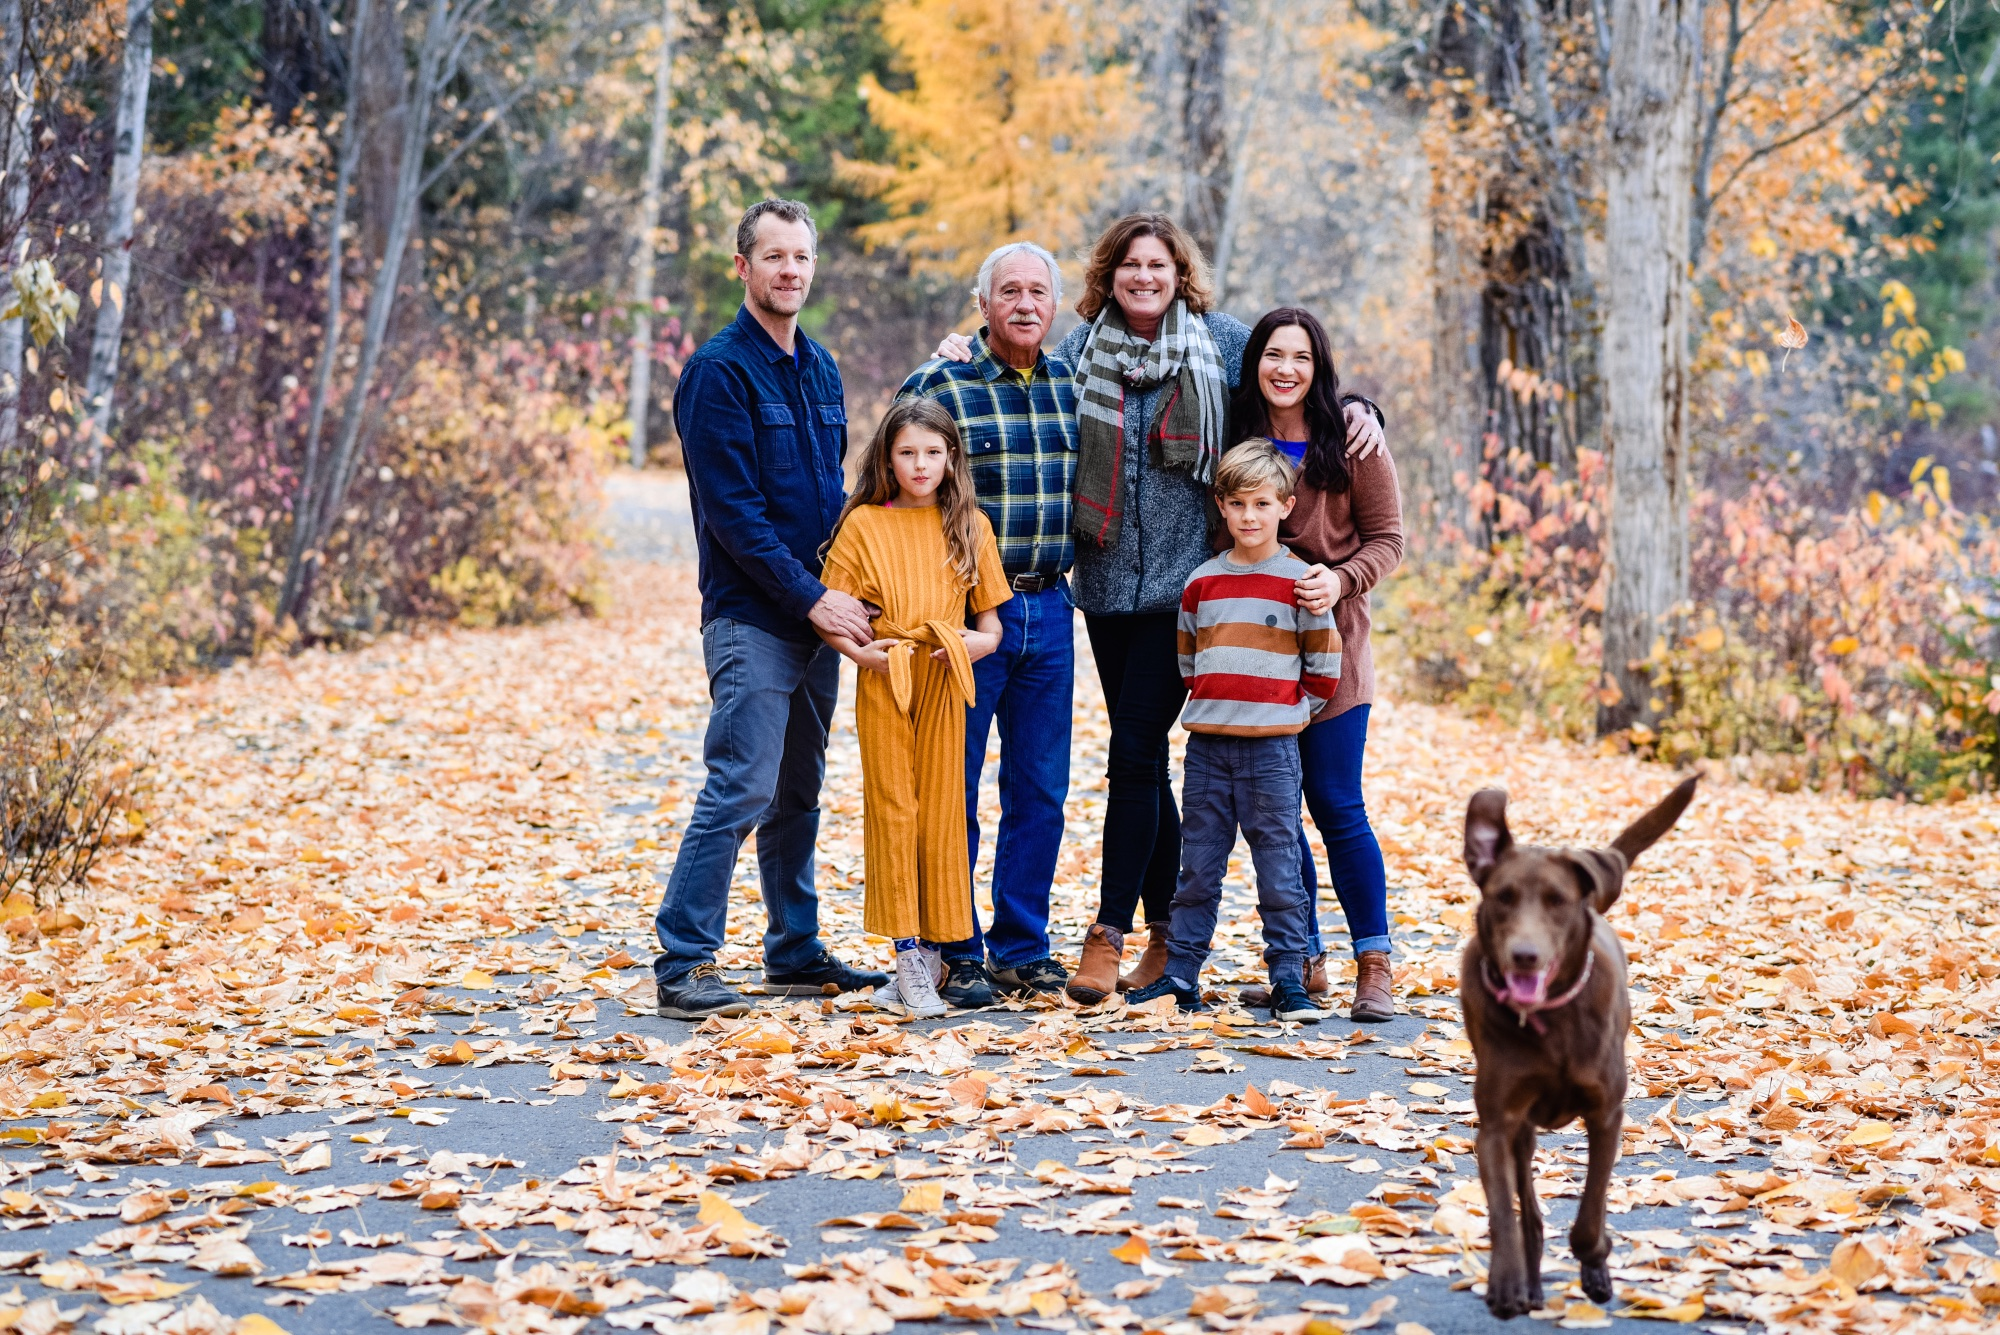 lindseyjane_family03.jpg